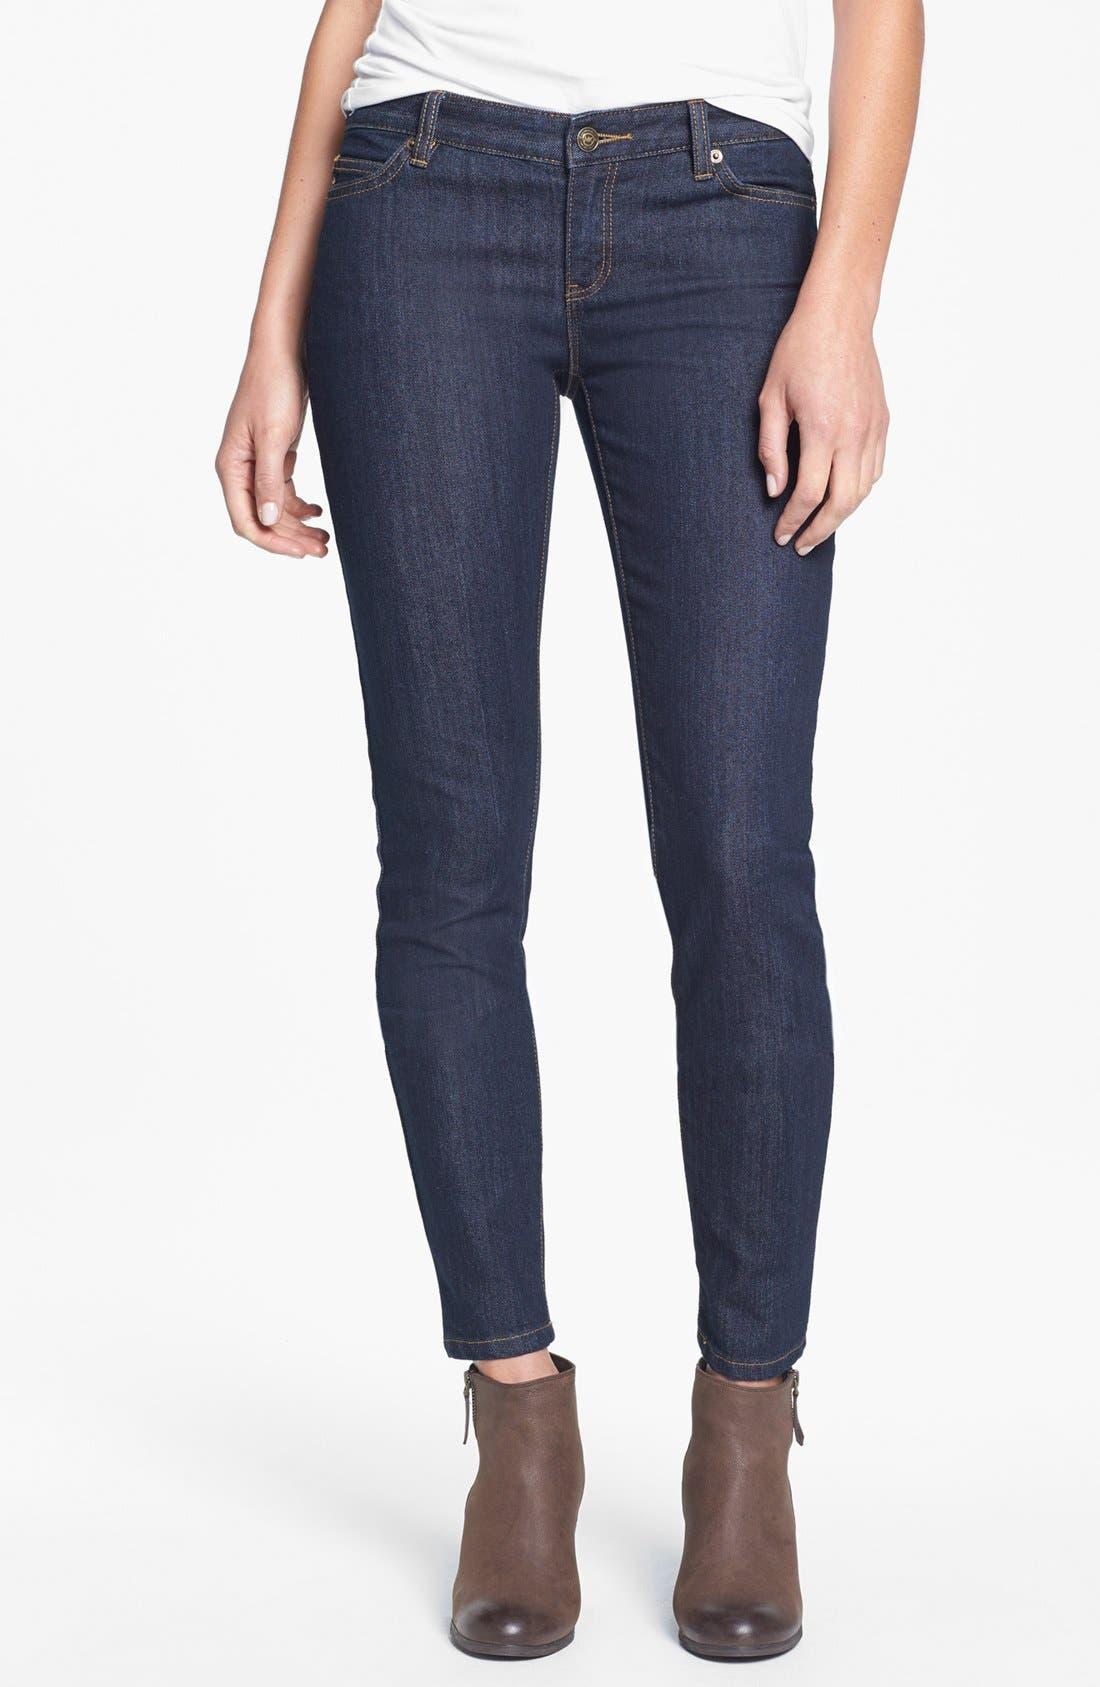 Alternate Image 1 Selected - MICHAEL Michael Kors 'Sausalito' Skinny Jeans (Petite)